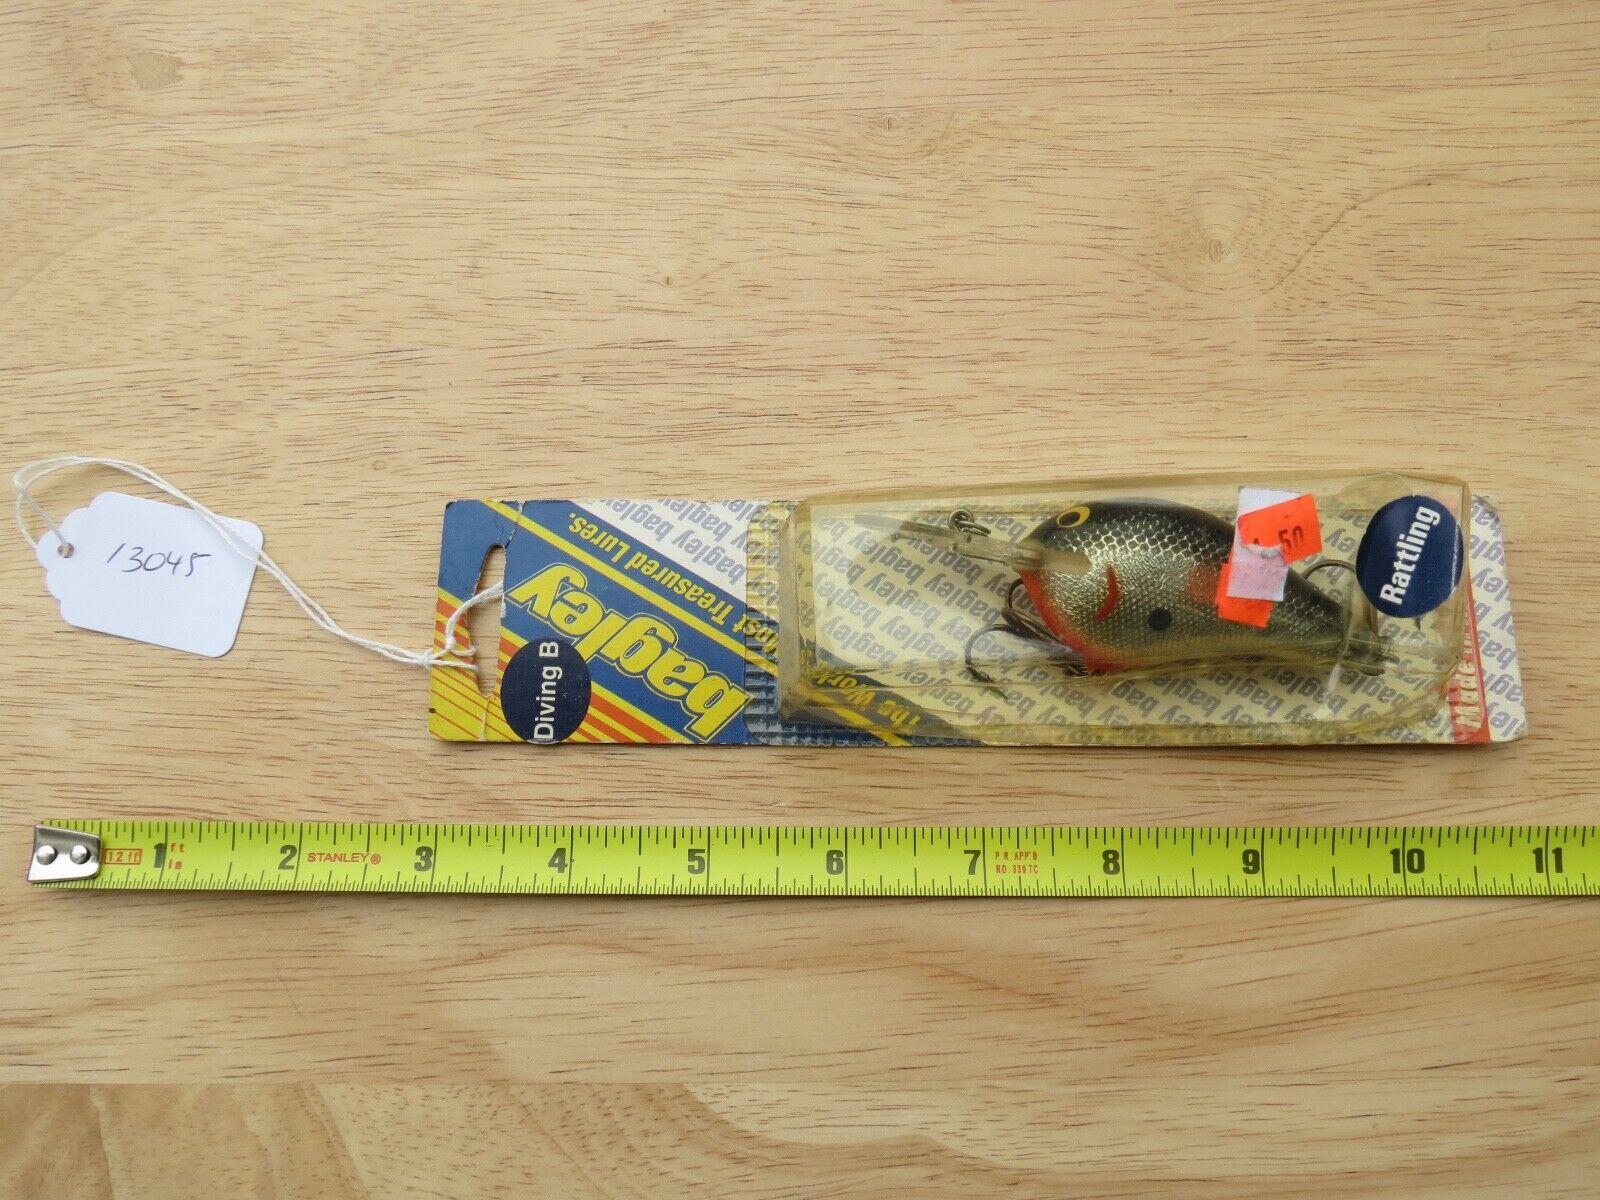 Bagleys Diving B2 Rattling DB2R B8 fishing lure made in USA  (lot)